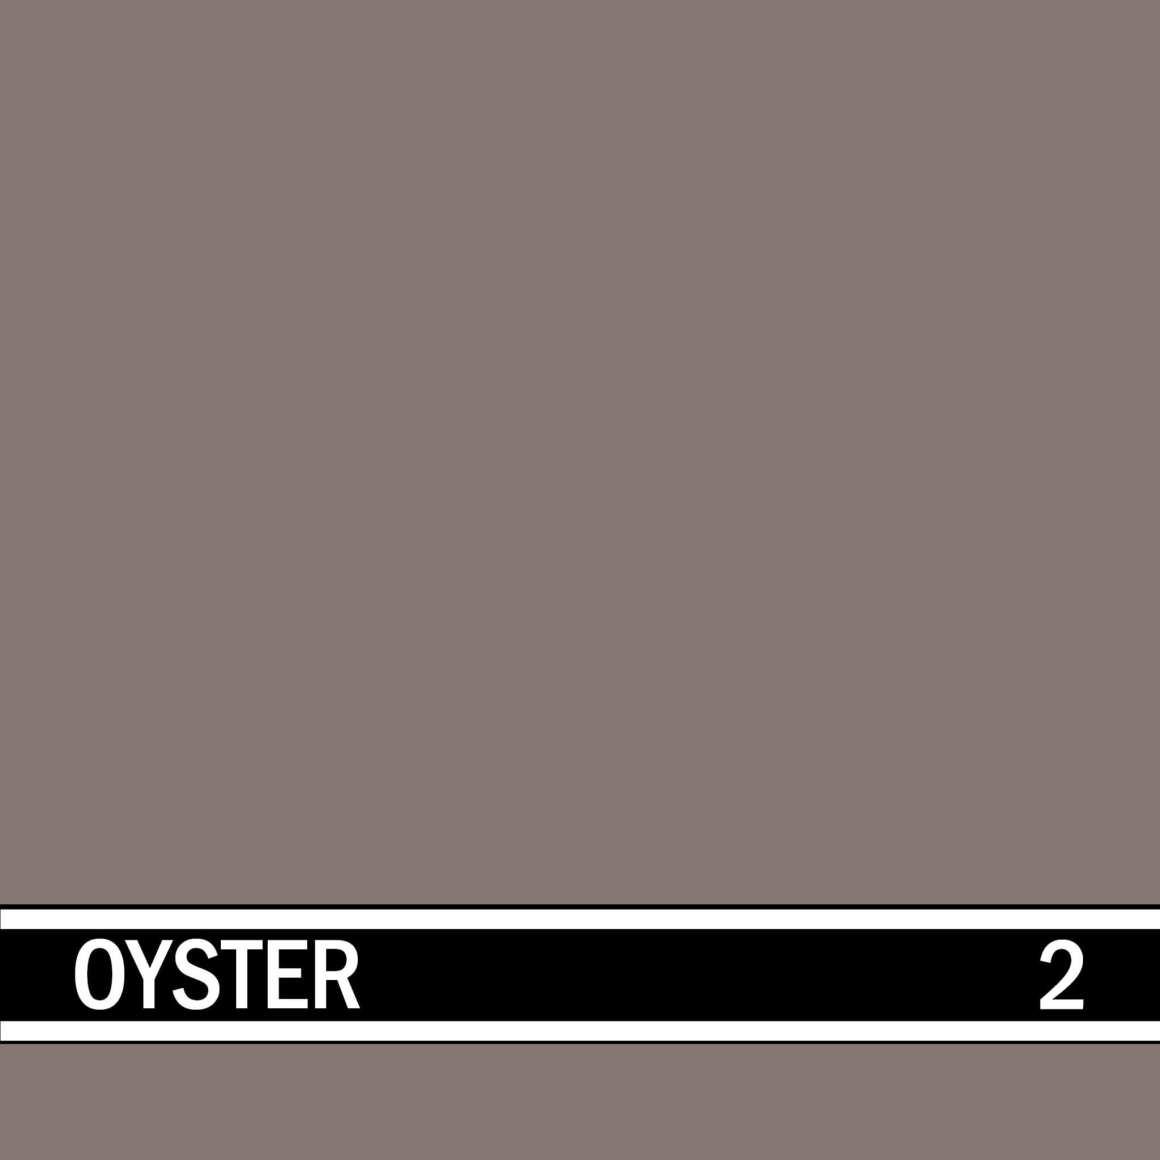 Oyster integral concrete color for stamped concrete and decorative colored concrete